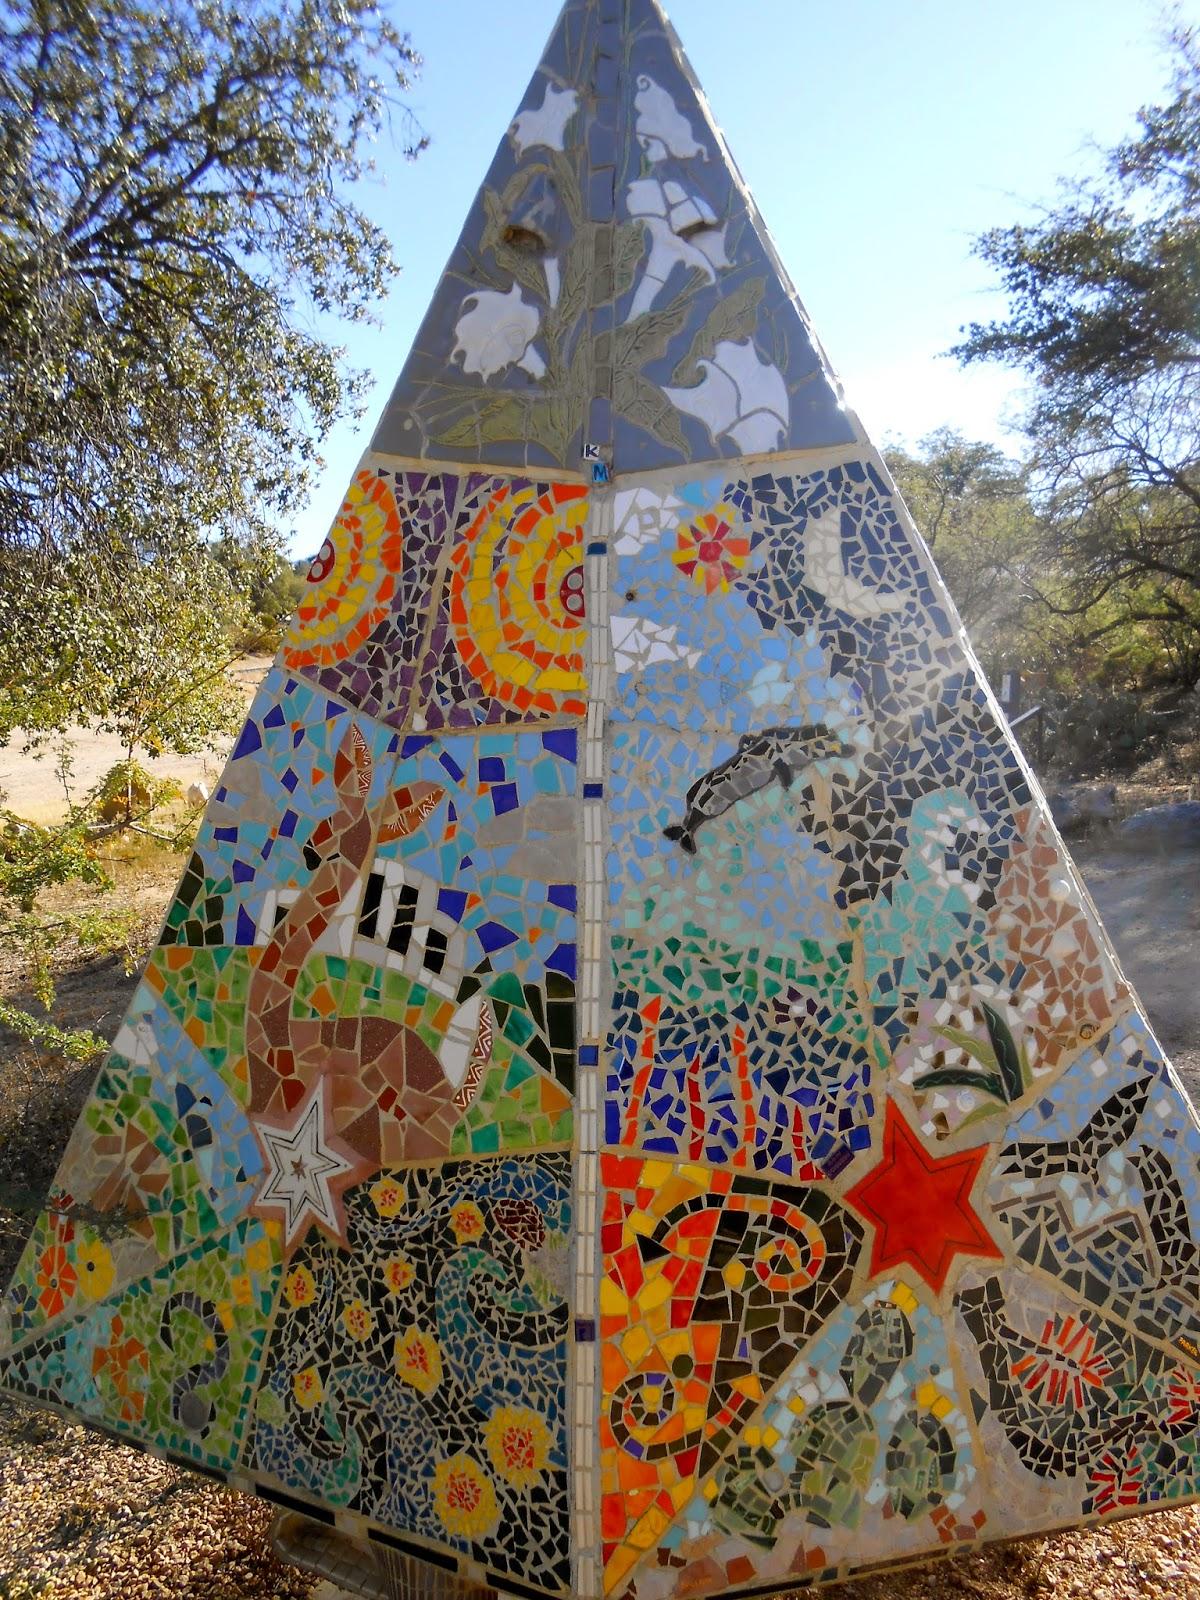 oracle arizona public library gardens